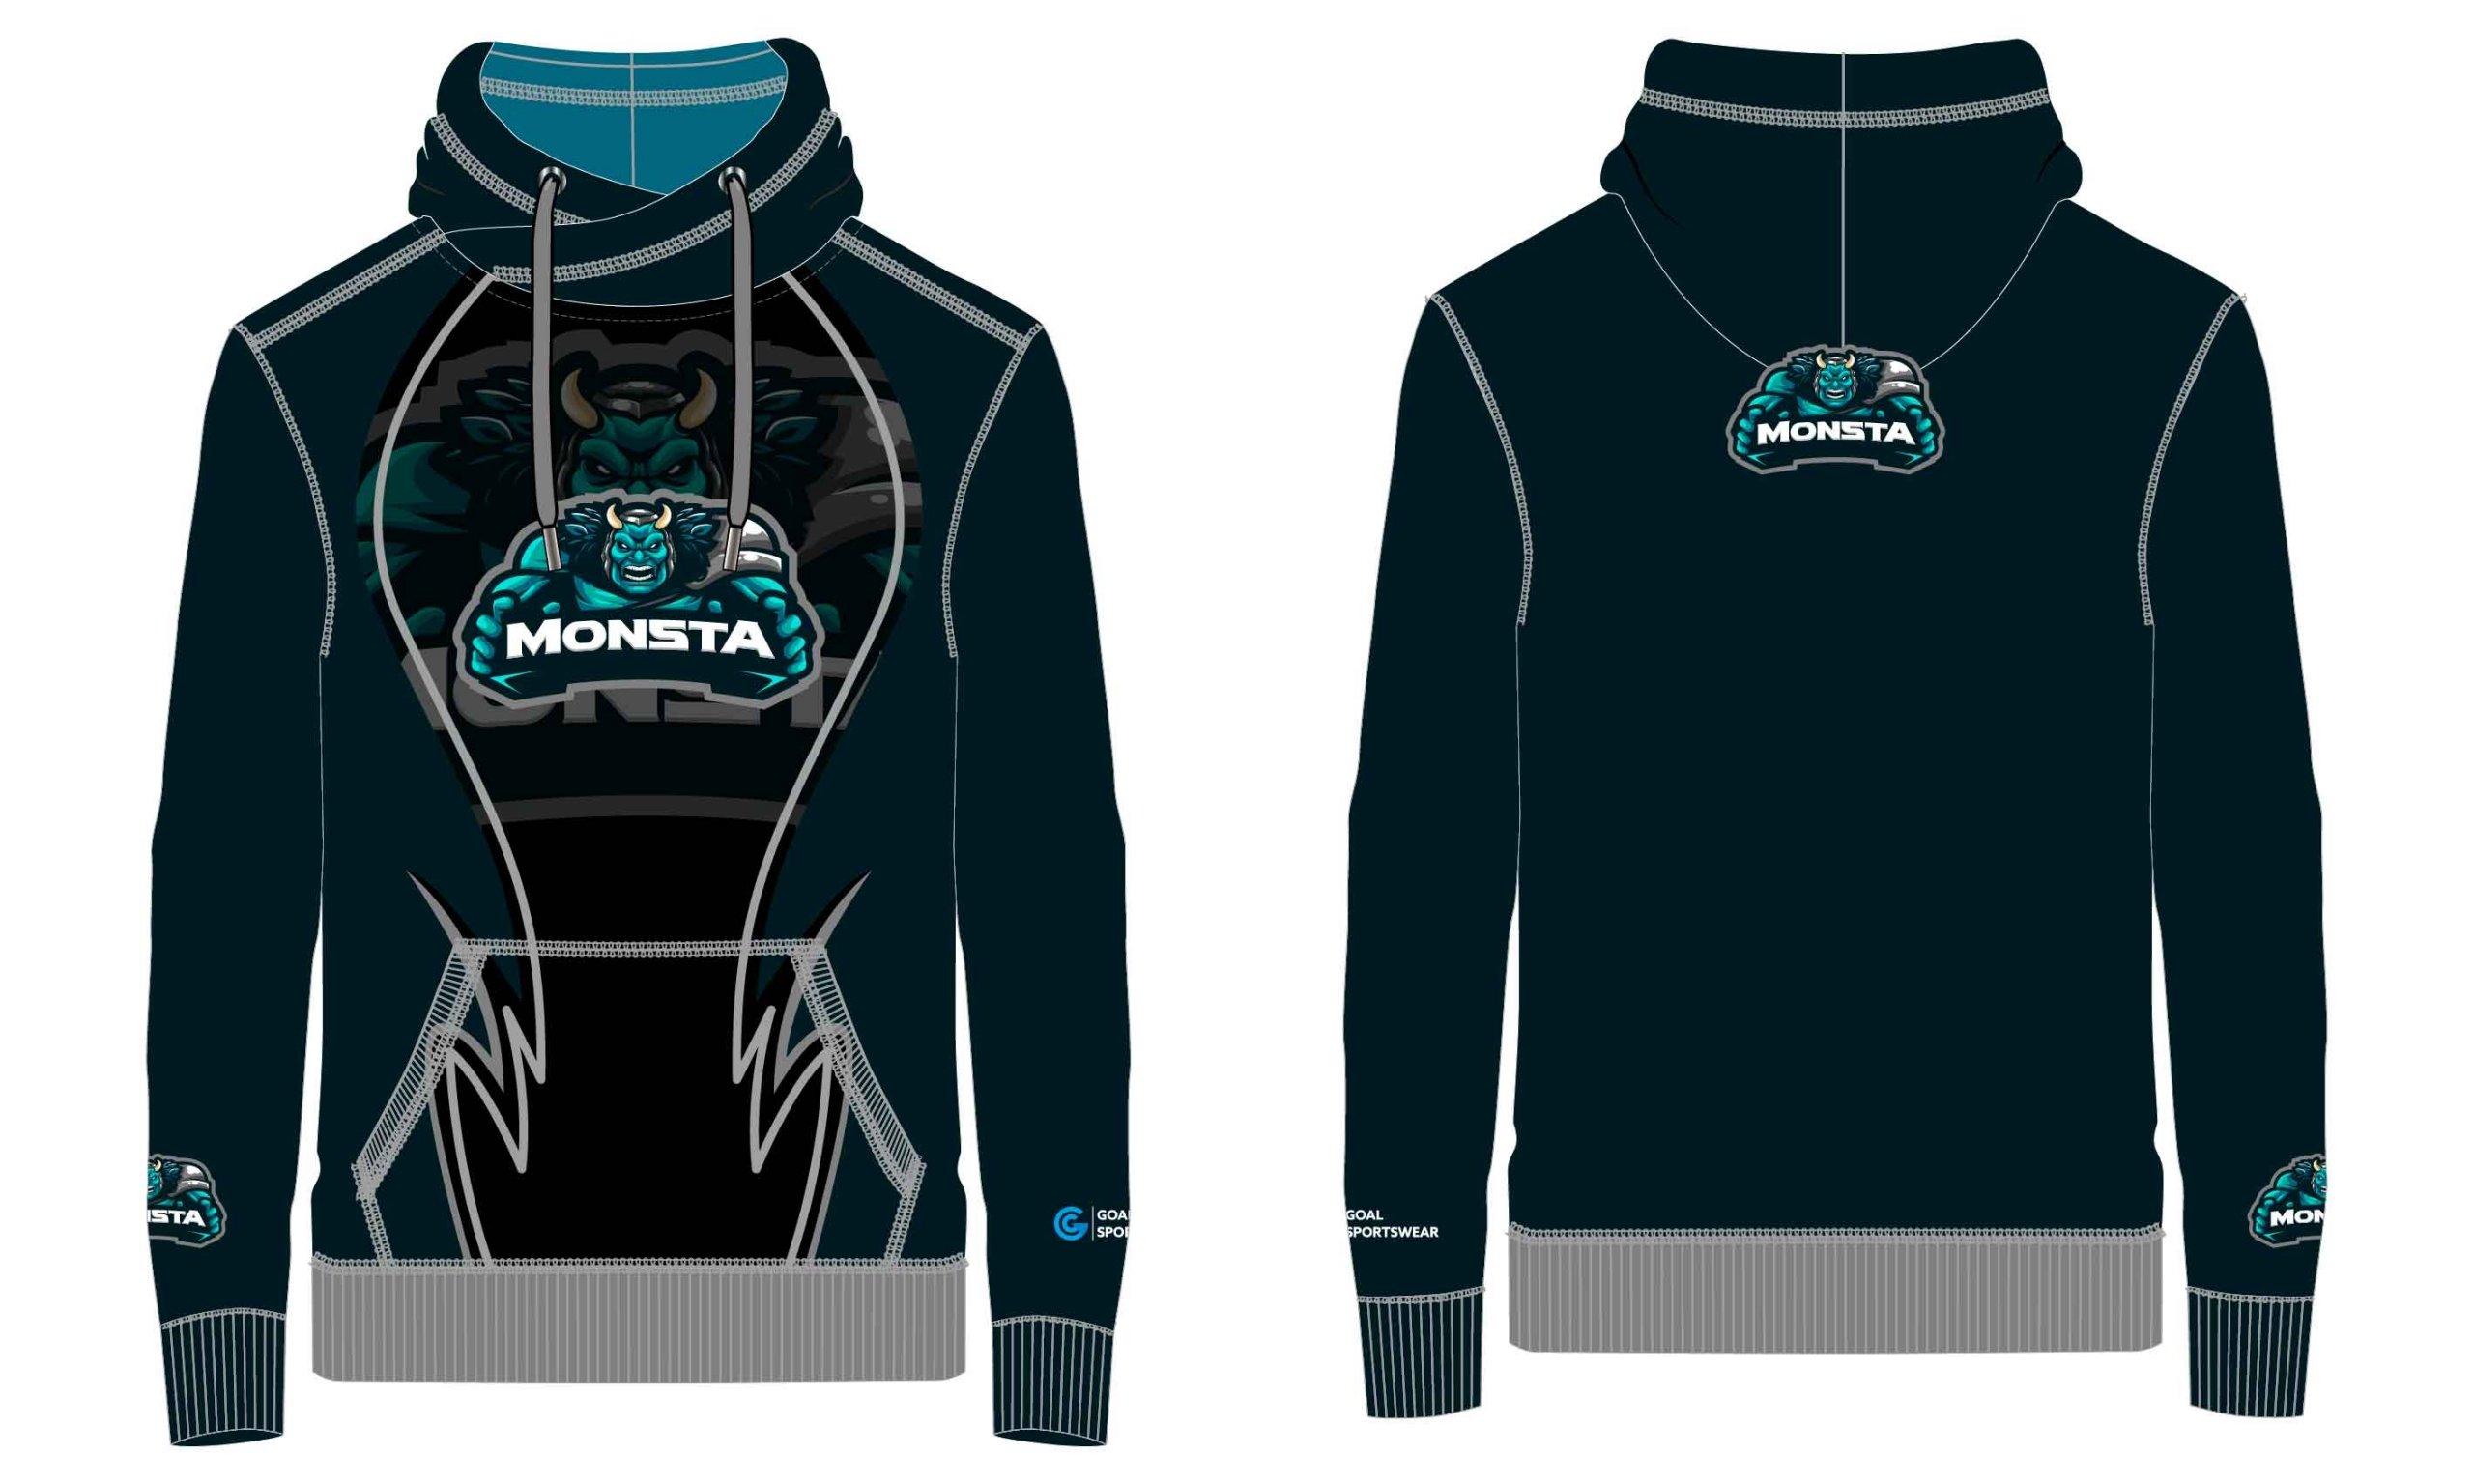 High school custom design sublimated reversible wrestling hoodies